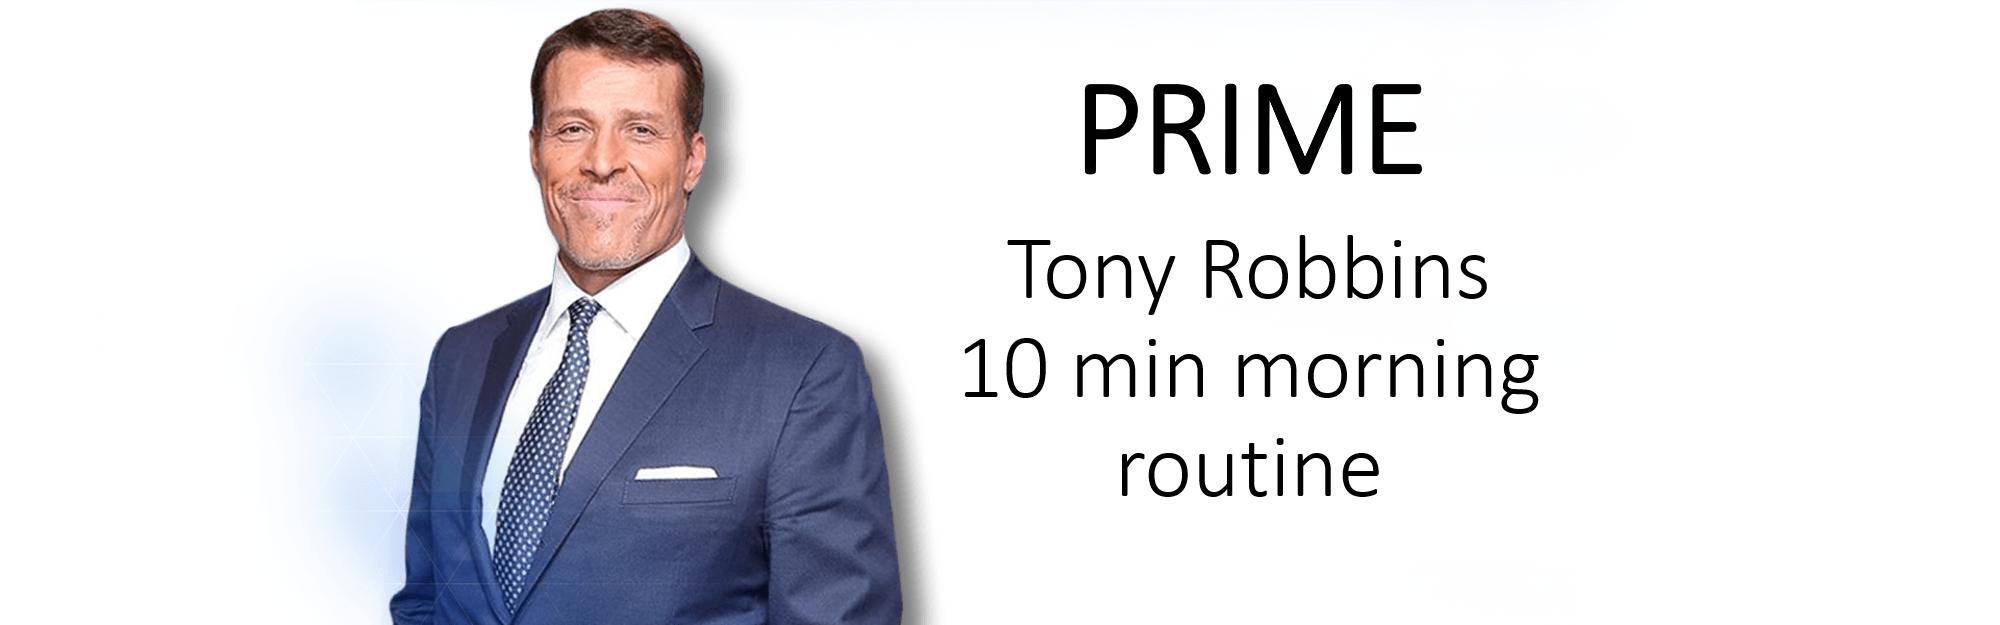 KEY TAKEAWAY FROM UPW WITH TONY ROBBINS – PRIME Yourself!